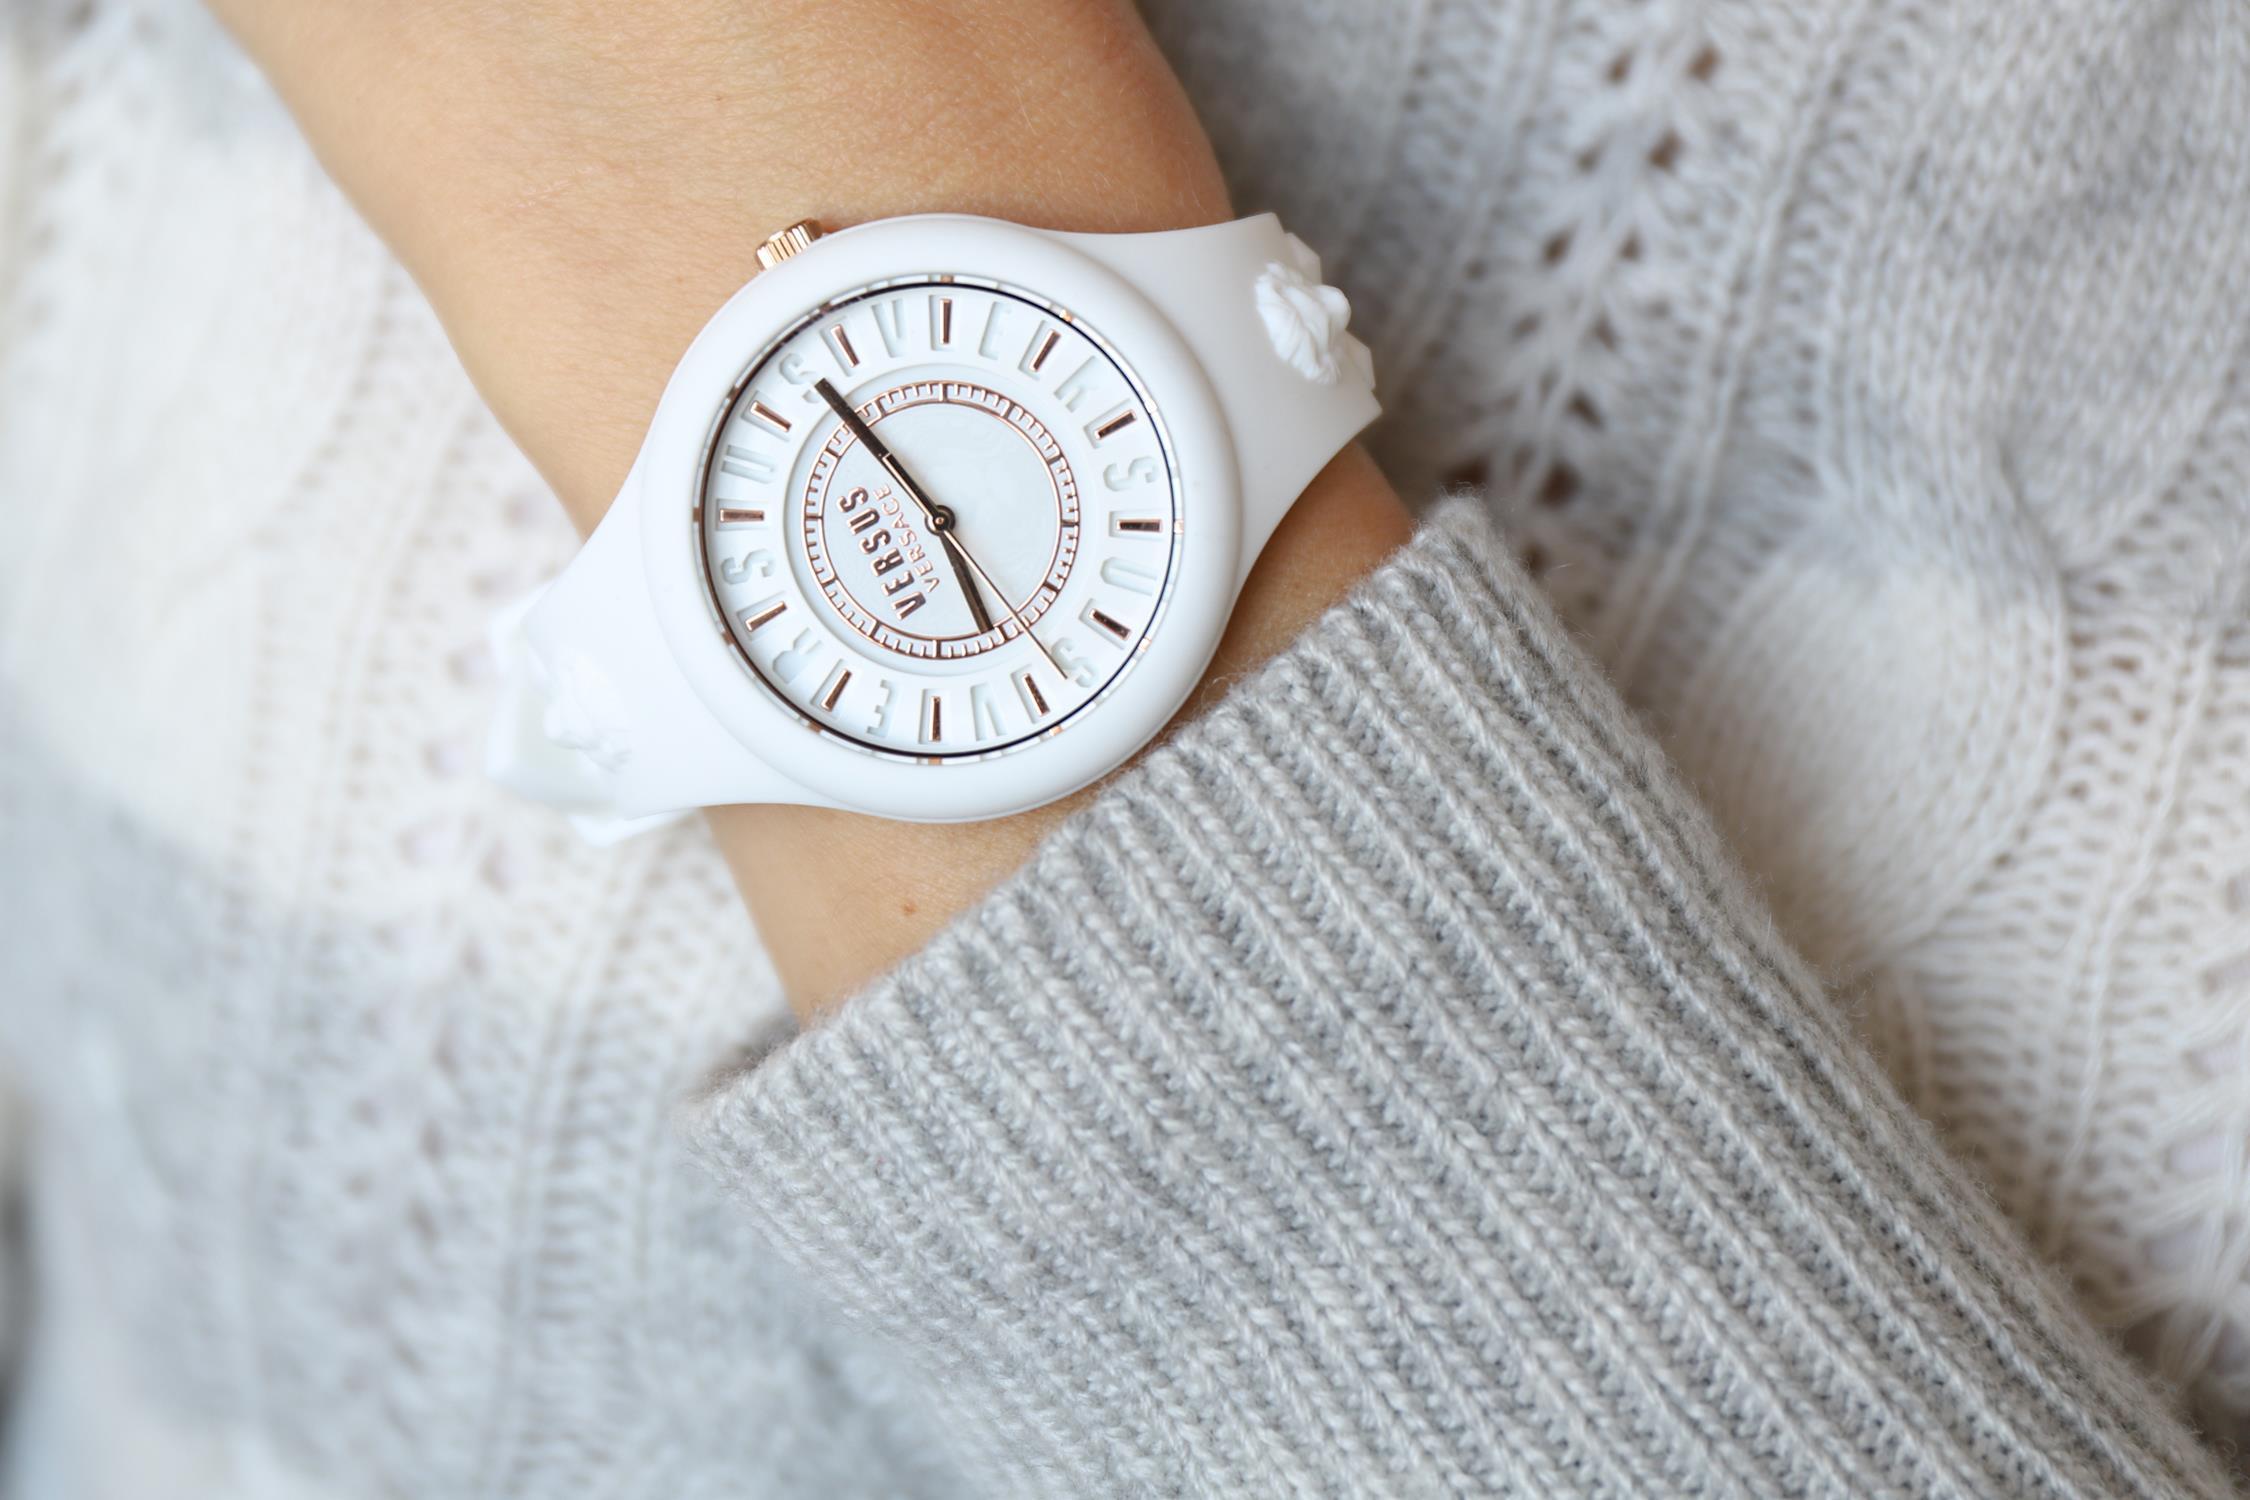 Versus Versace VSPOQ4219 zegarek biały fashion/modowy Damskie pasek